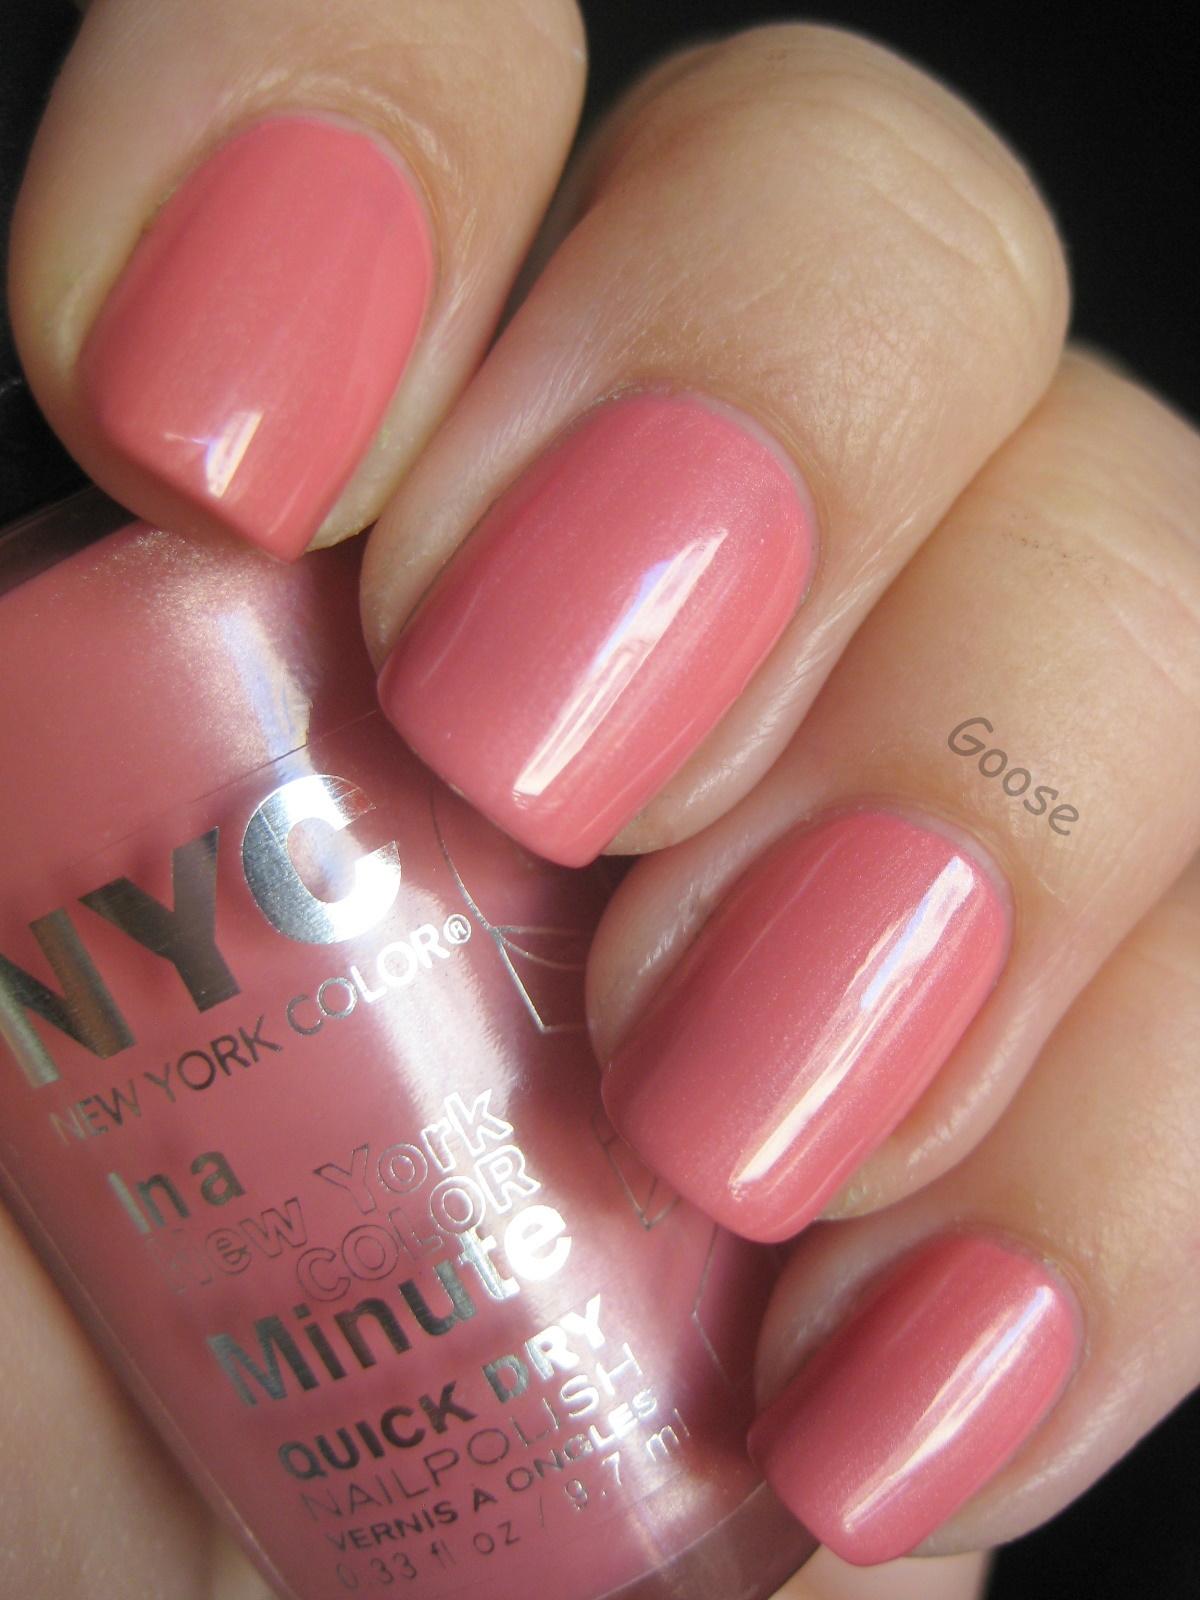 Goose\'s Glitter: NYC - Prospect Park Pink